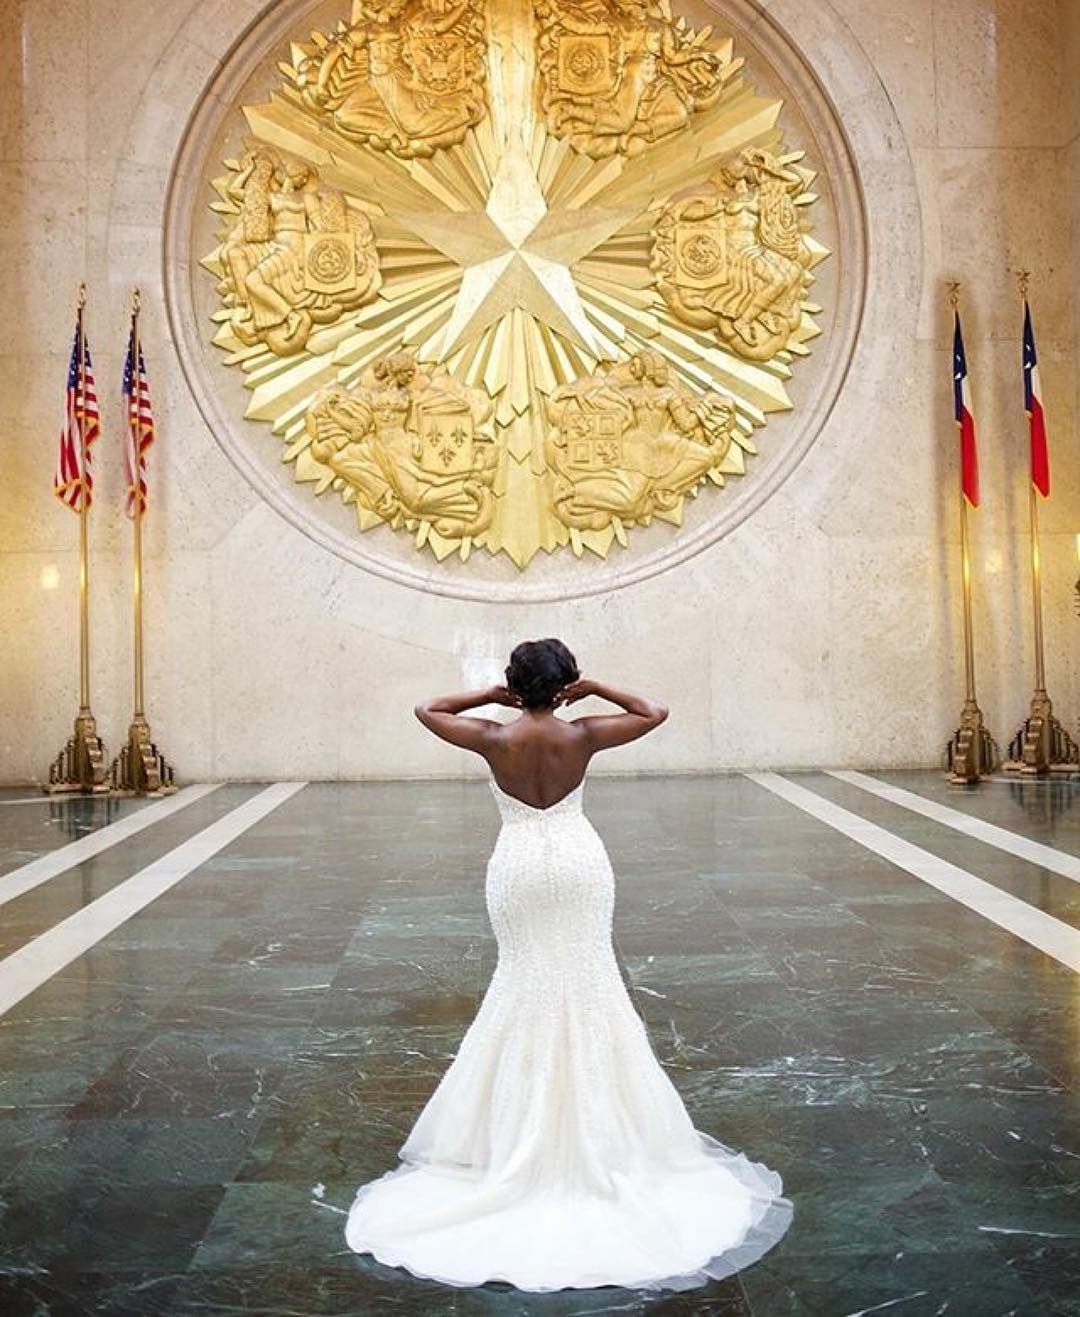 😍😍✨✨✨💝 Photo by 📸 @ksebastianphoto #realafricanweddings  #naturalista  #naturallight #aka #nature #weddingphotographer #Engagementpictures #blacklove #blackgreeks  #chocolatebridesandgrooms #munaluchibride #weddingsonpoint #bestoftheday #menwithstyle #womensfashion #womenstyle #naija #ebonylove #dfwphotographers #vscocam #shoottokill #shotsfired #macmakeup #slayed #naturalhair #nigeria #blackbride1998 #aisleperfect